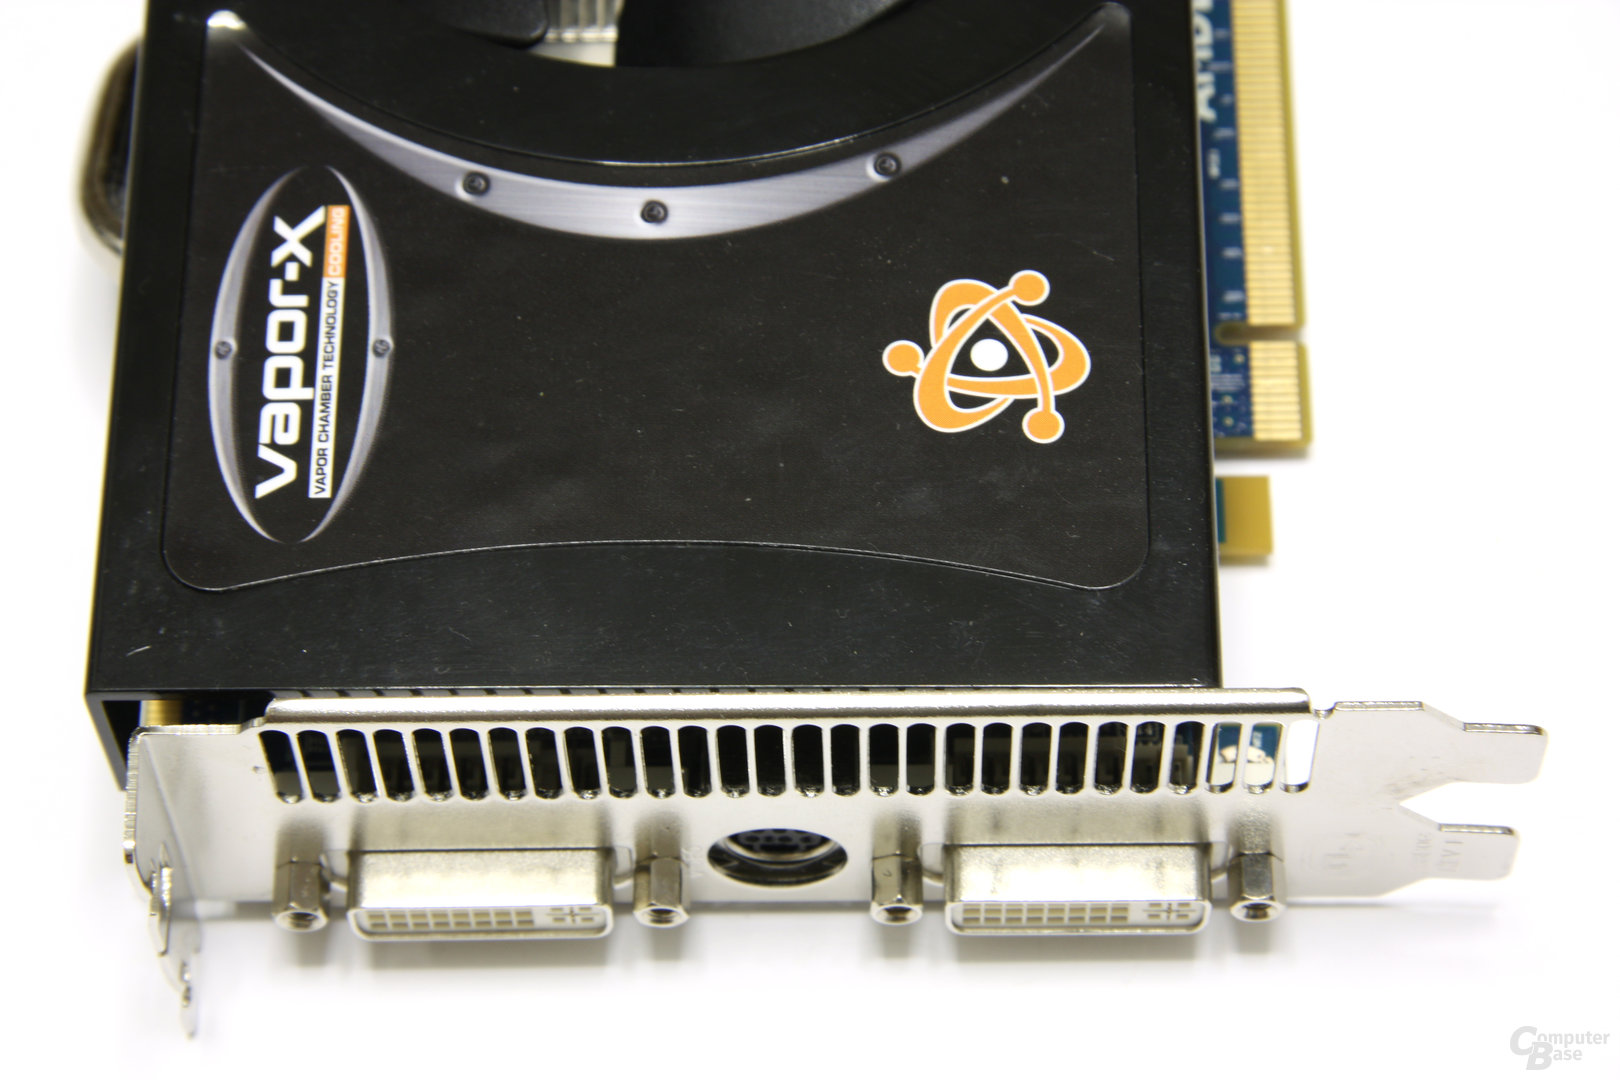 Radeon HD 4890 Atomic Anschlüsse